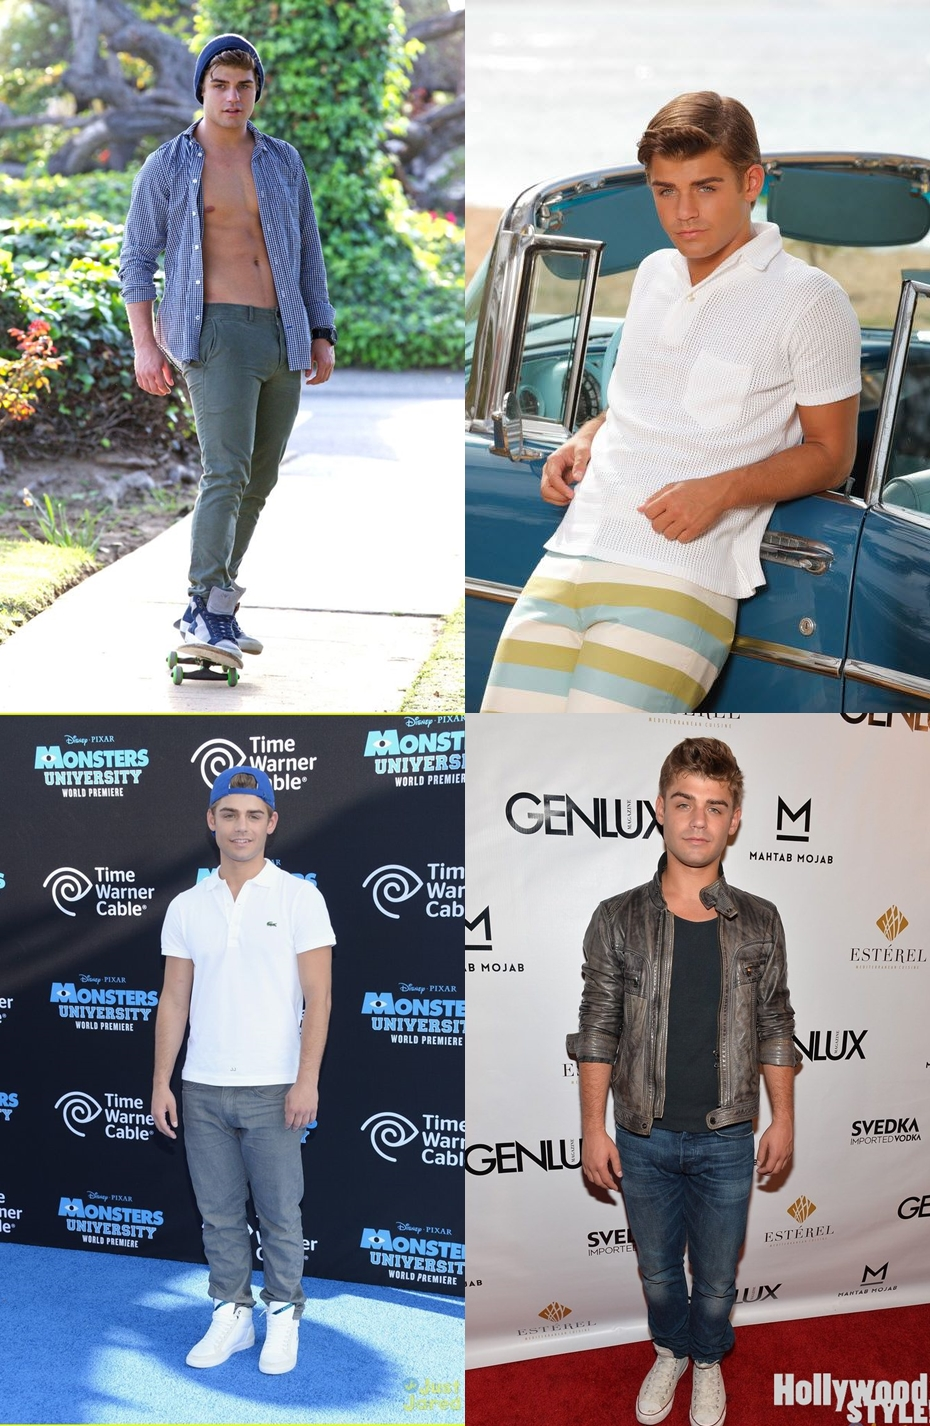 Tanner, Garret Clayton, style, estilo, estilo masculino, fashion blogger, fashion tips, blog de moda, moda sem censura, alex cursino, dicas de moda, moda masculina, menswear, 3